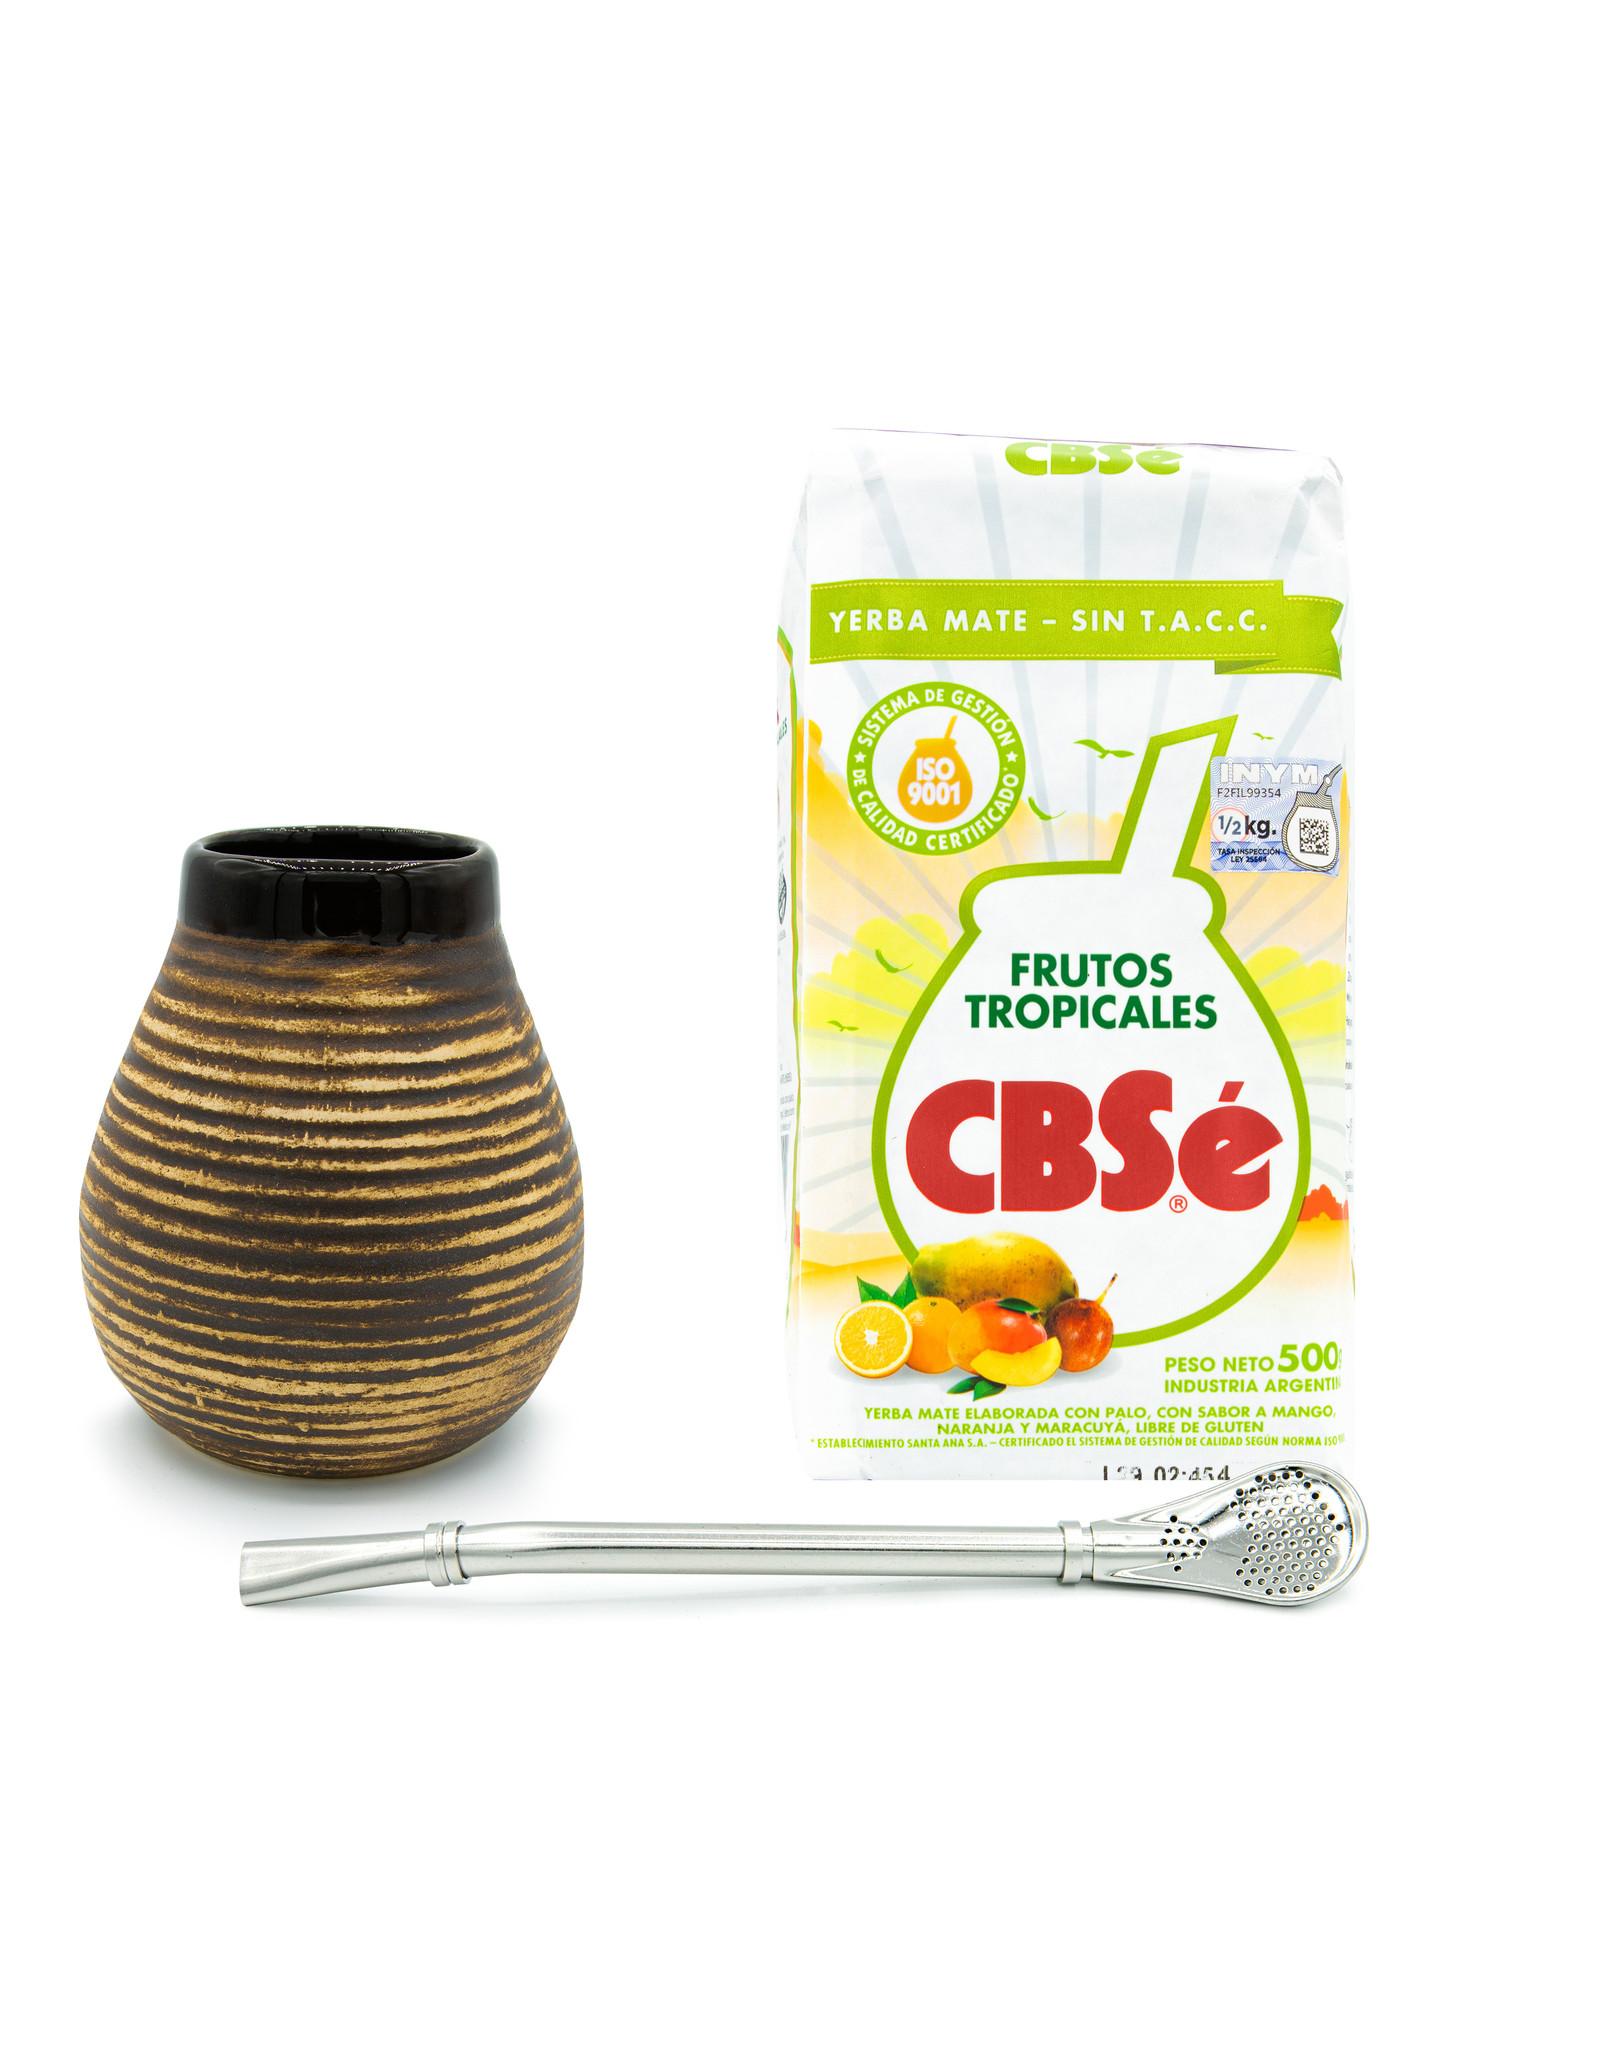 Starterskit calabaza céramique beige/brune